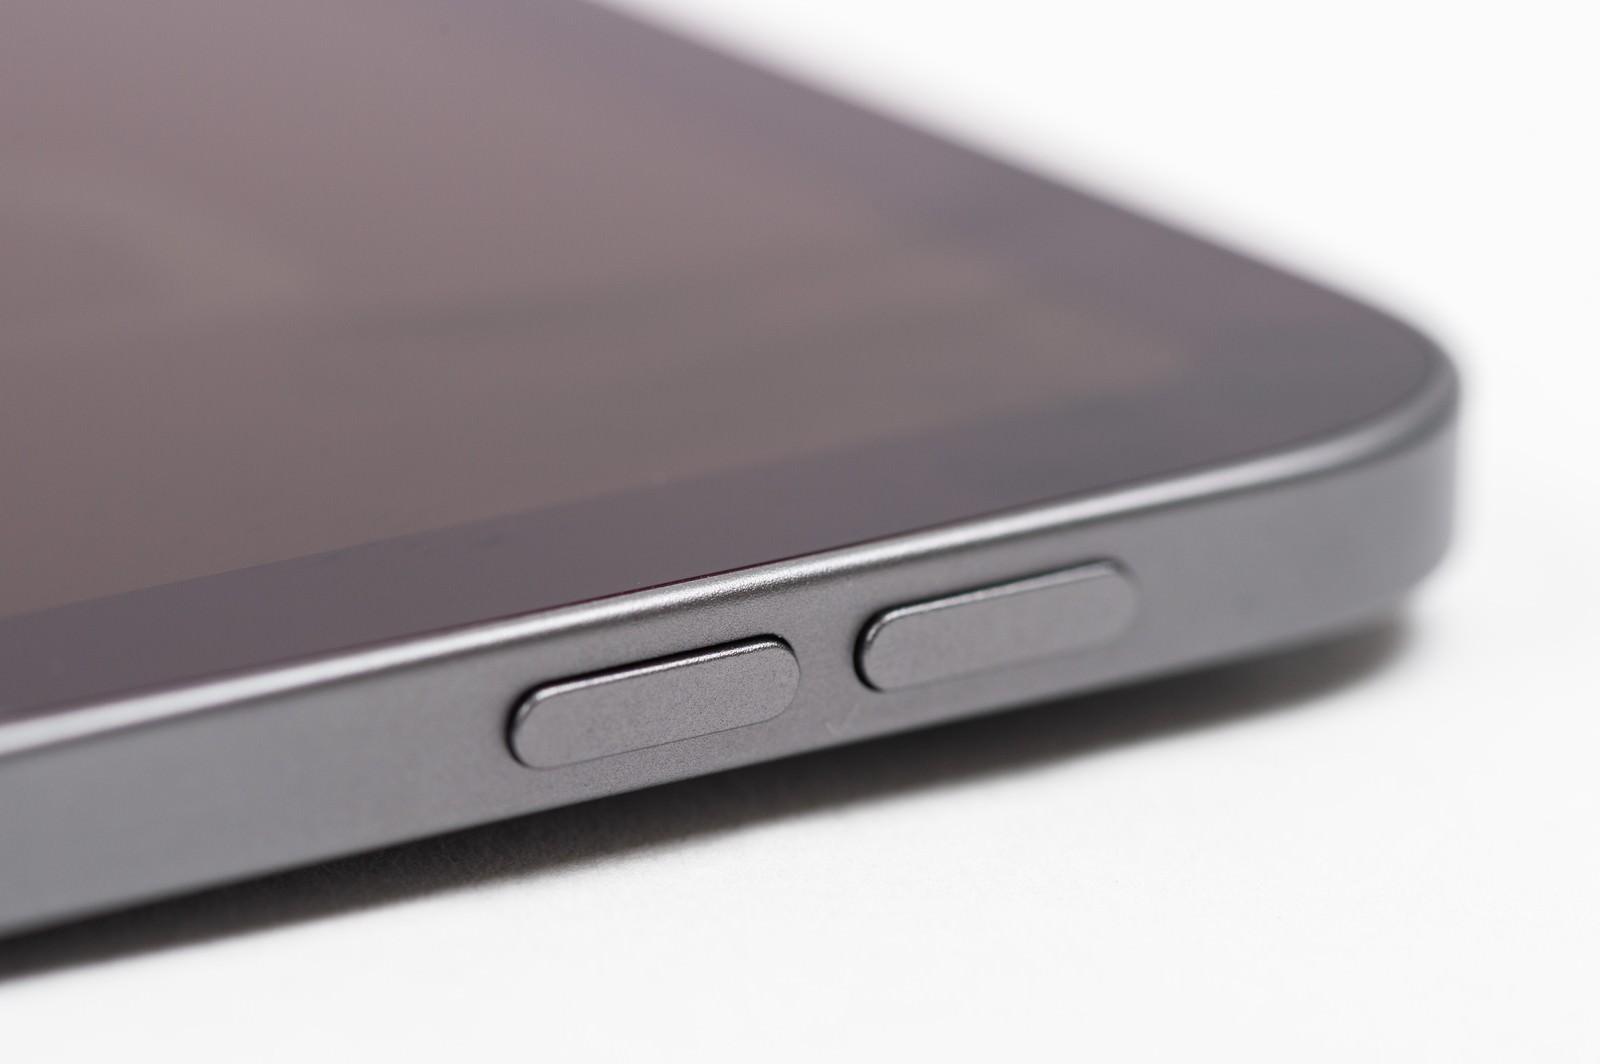 「iPad Pro 音量ボタン(サイドボタン)」の写真